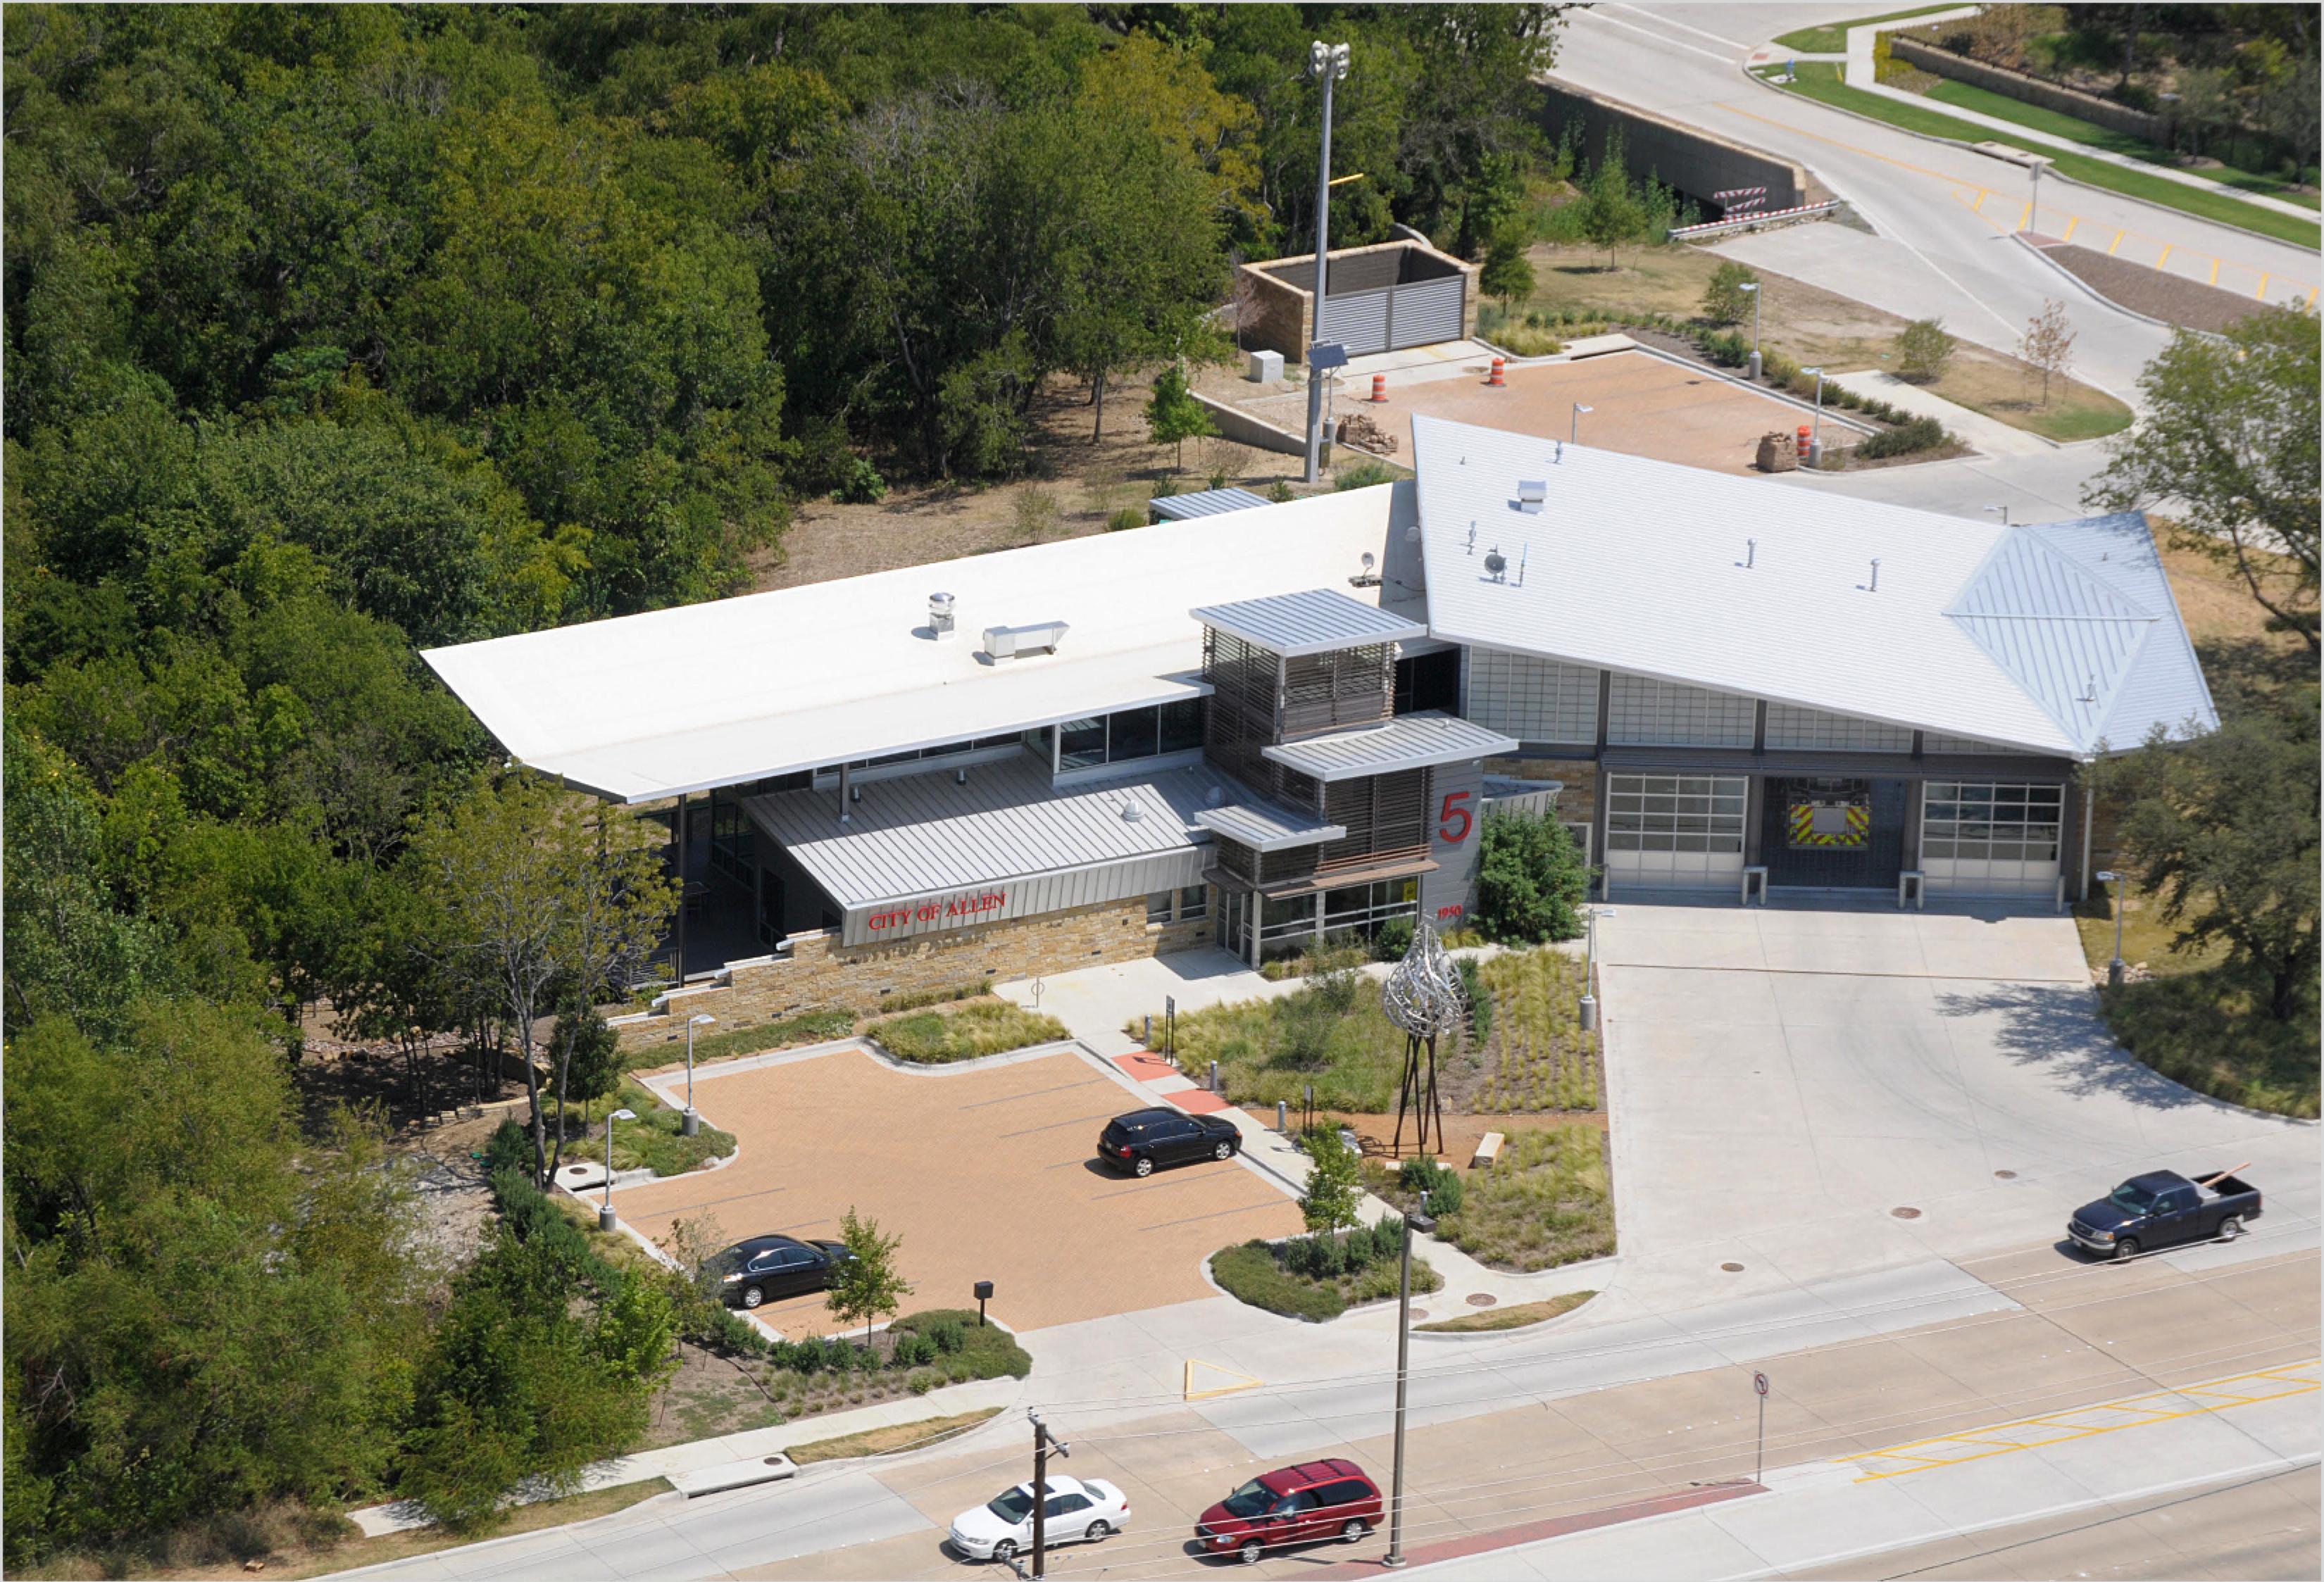 Ramon Franklin Llc Fort Worth Texas Proview